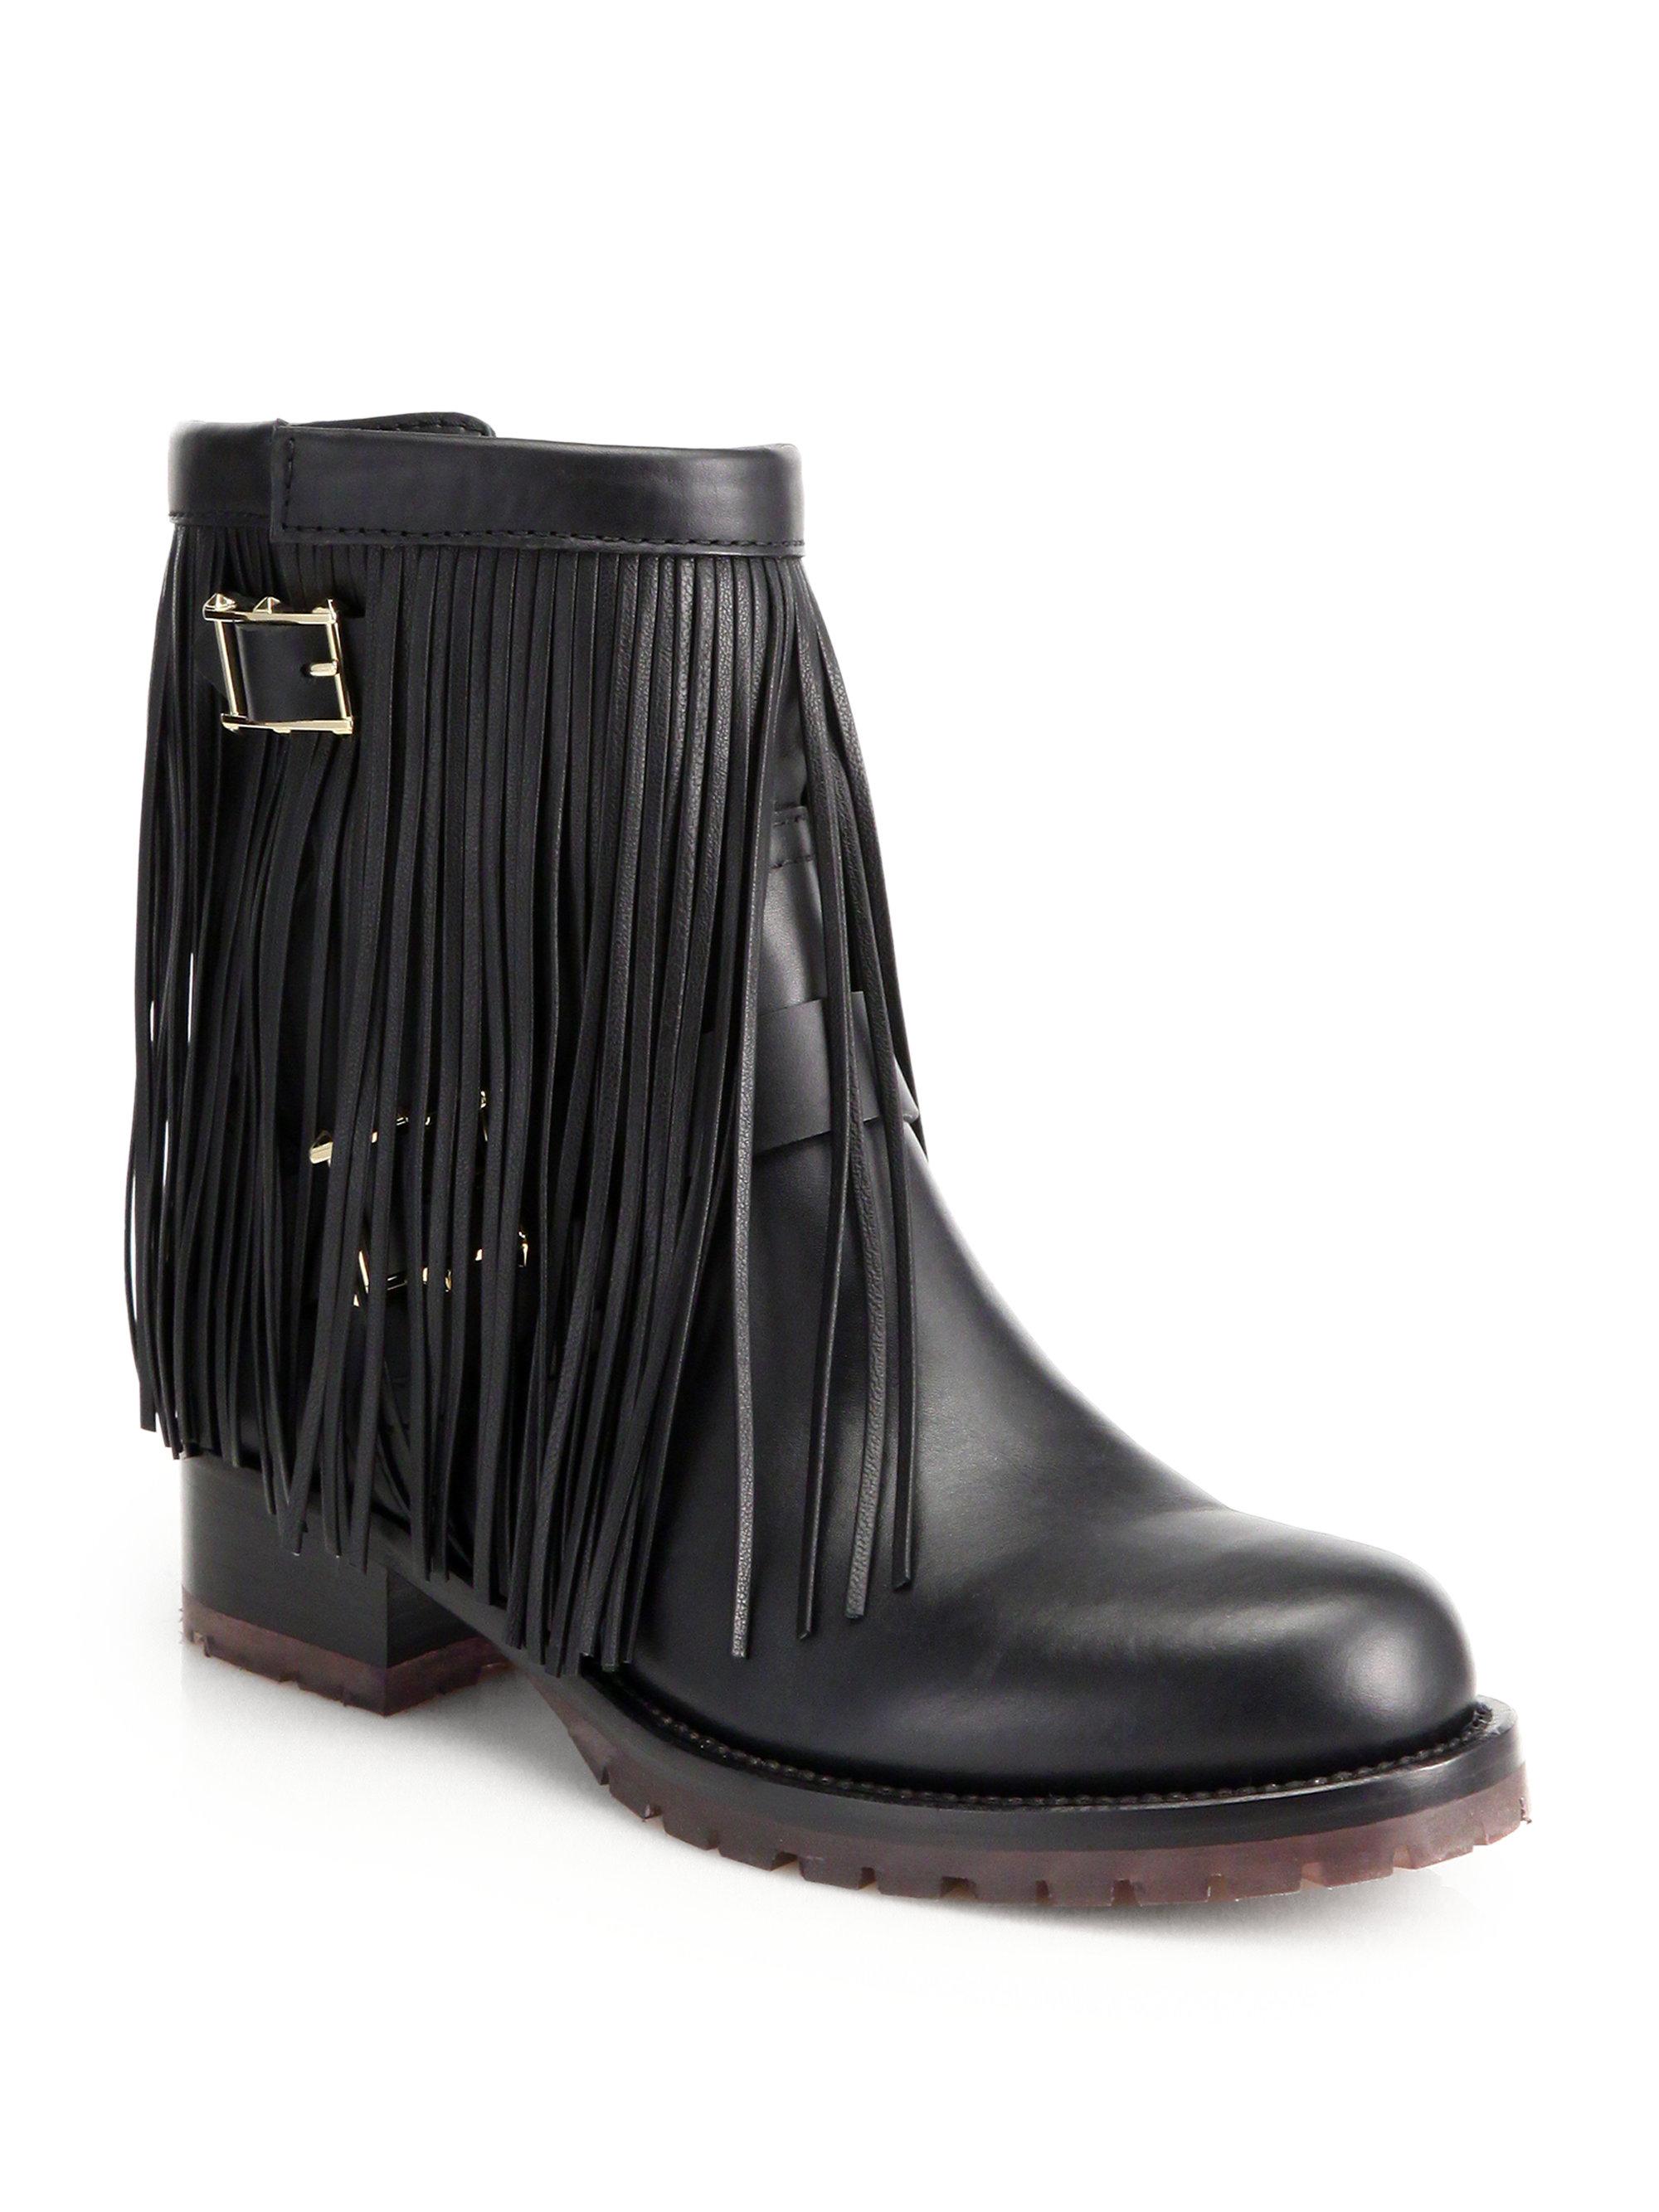 Valentino Moto Fringe Leather Biker Ankle Boots in Black | Lyst